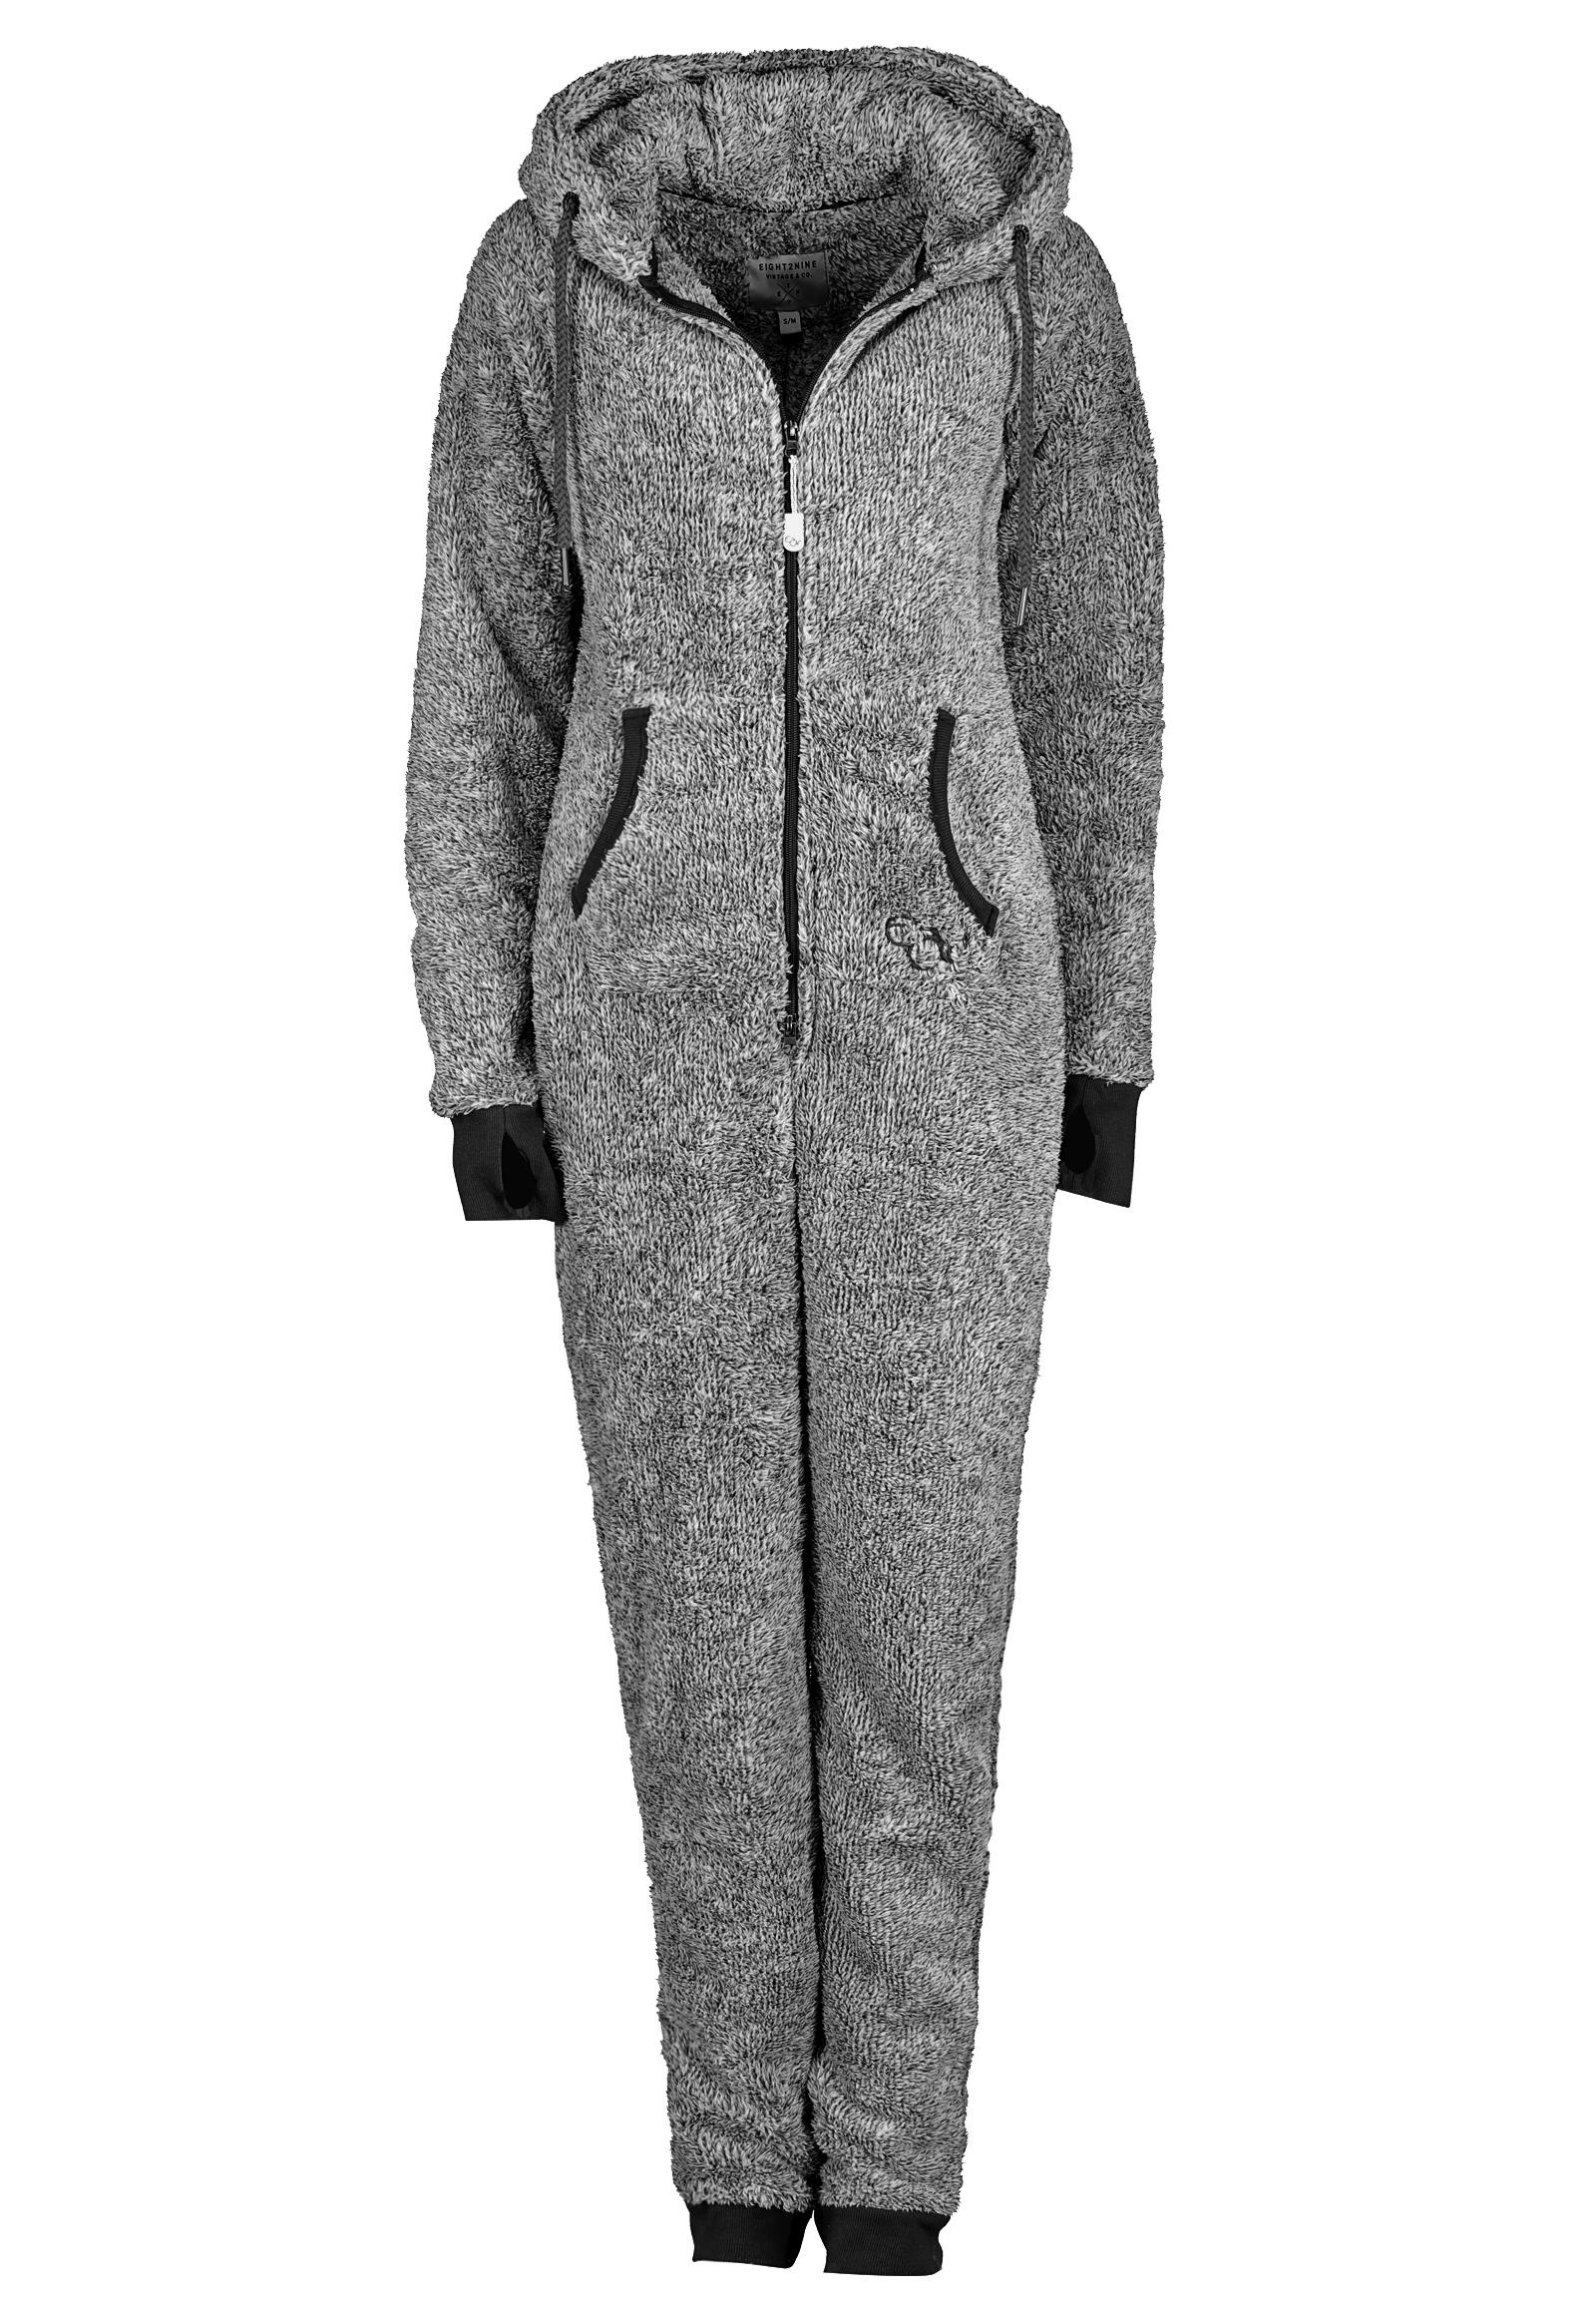 jumpsuit teddy fleece overall ganzk rperanzug ohren damen. Black Bedroom Furniture Sets. Home Design Ideas